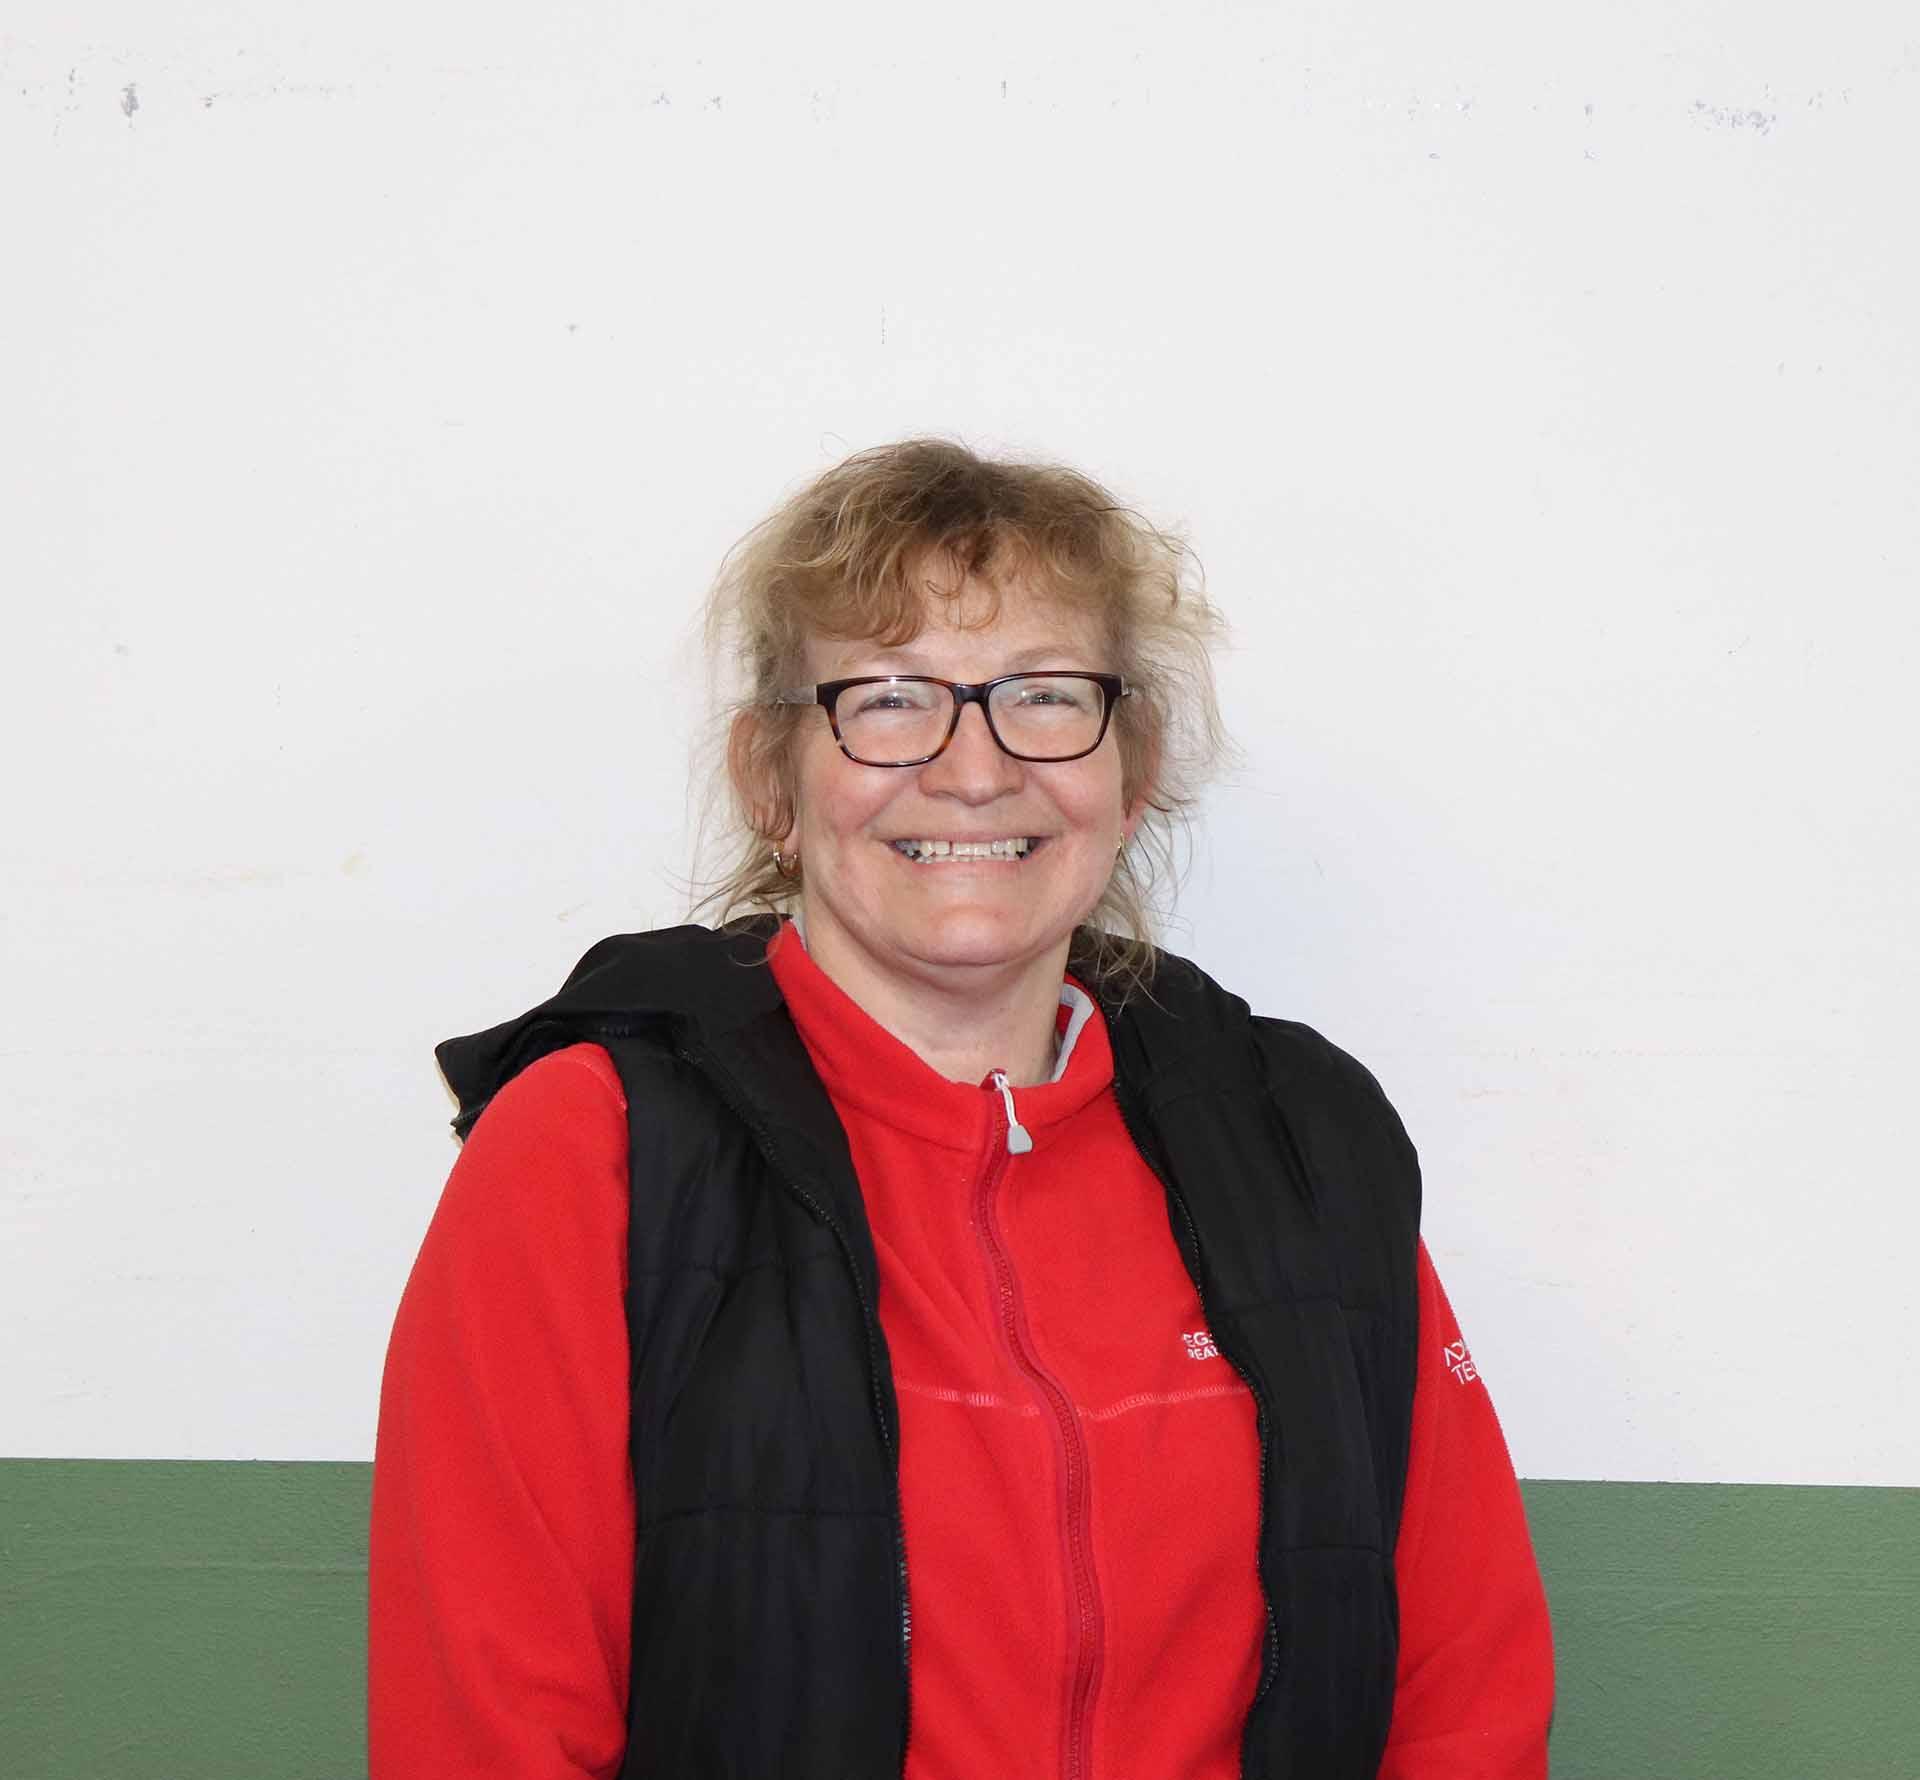 Karin Neuhaus